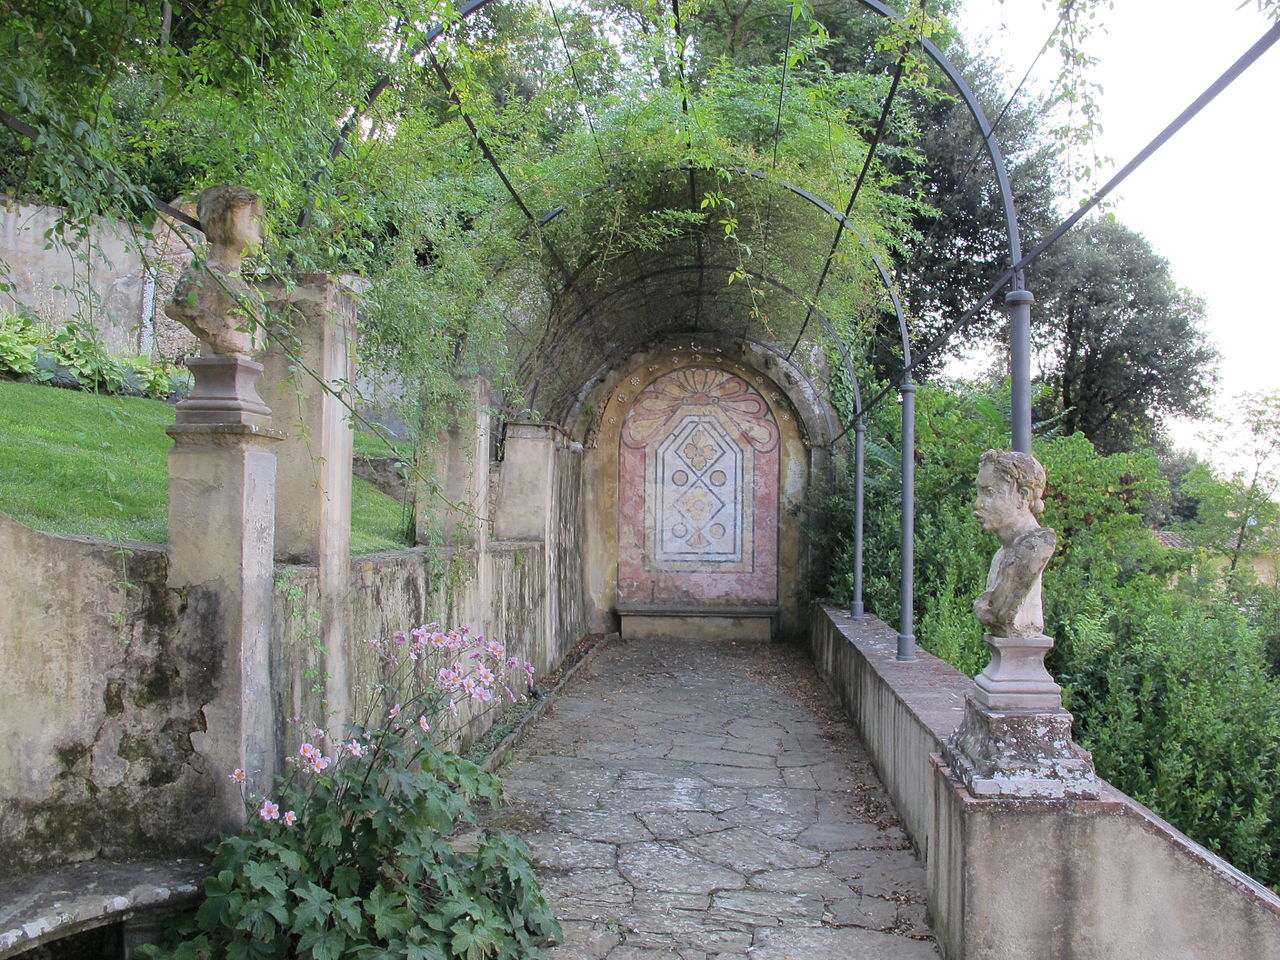 Firenze, Giardino Bardini, pergola e fontana con sfondo a mosaico